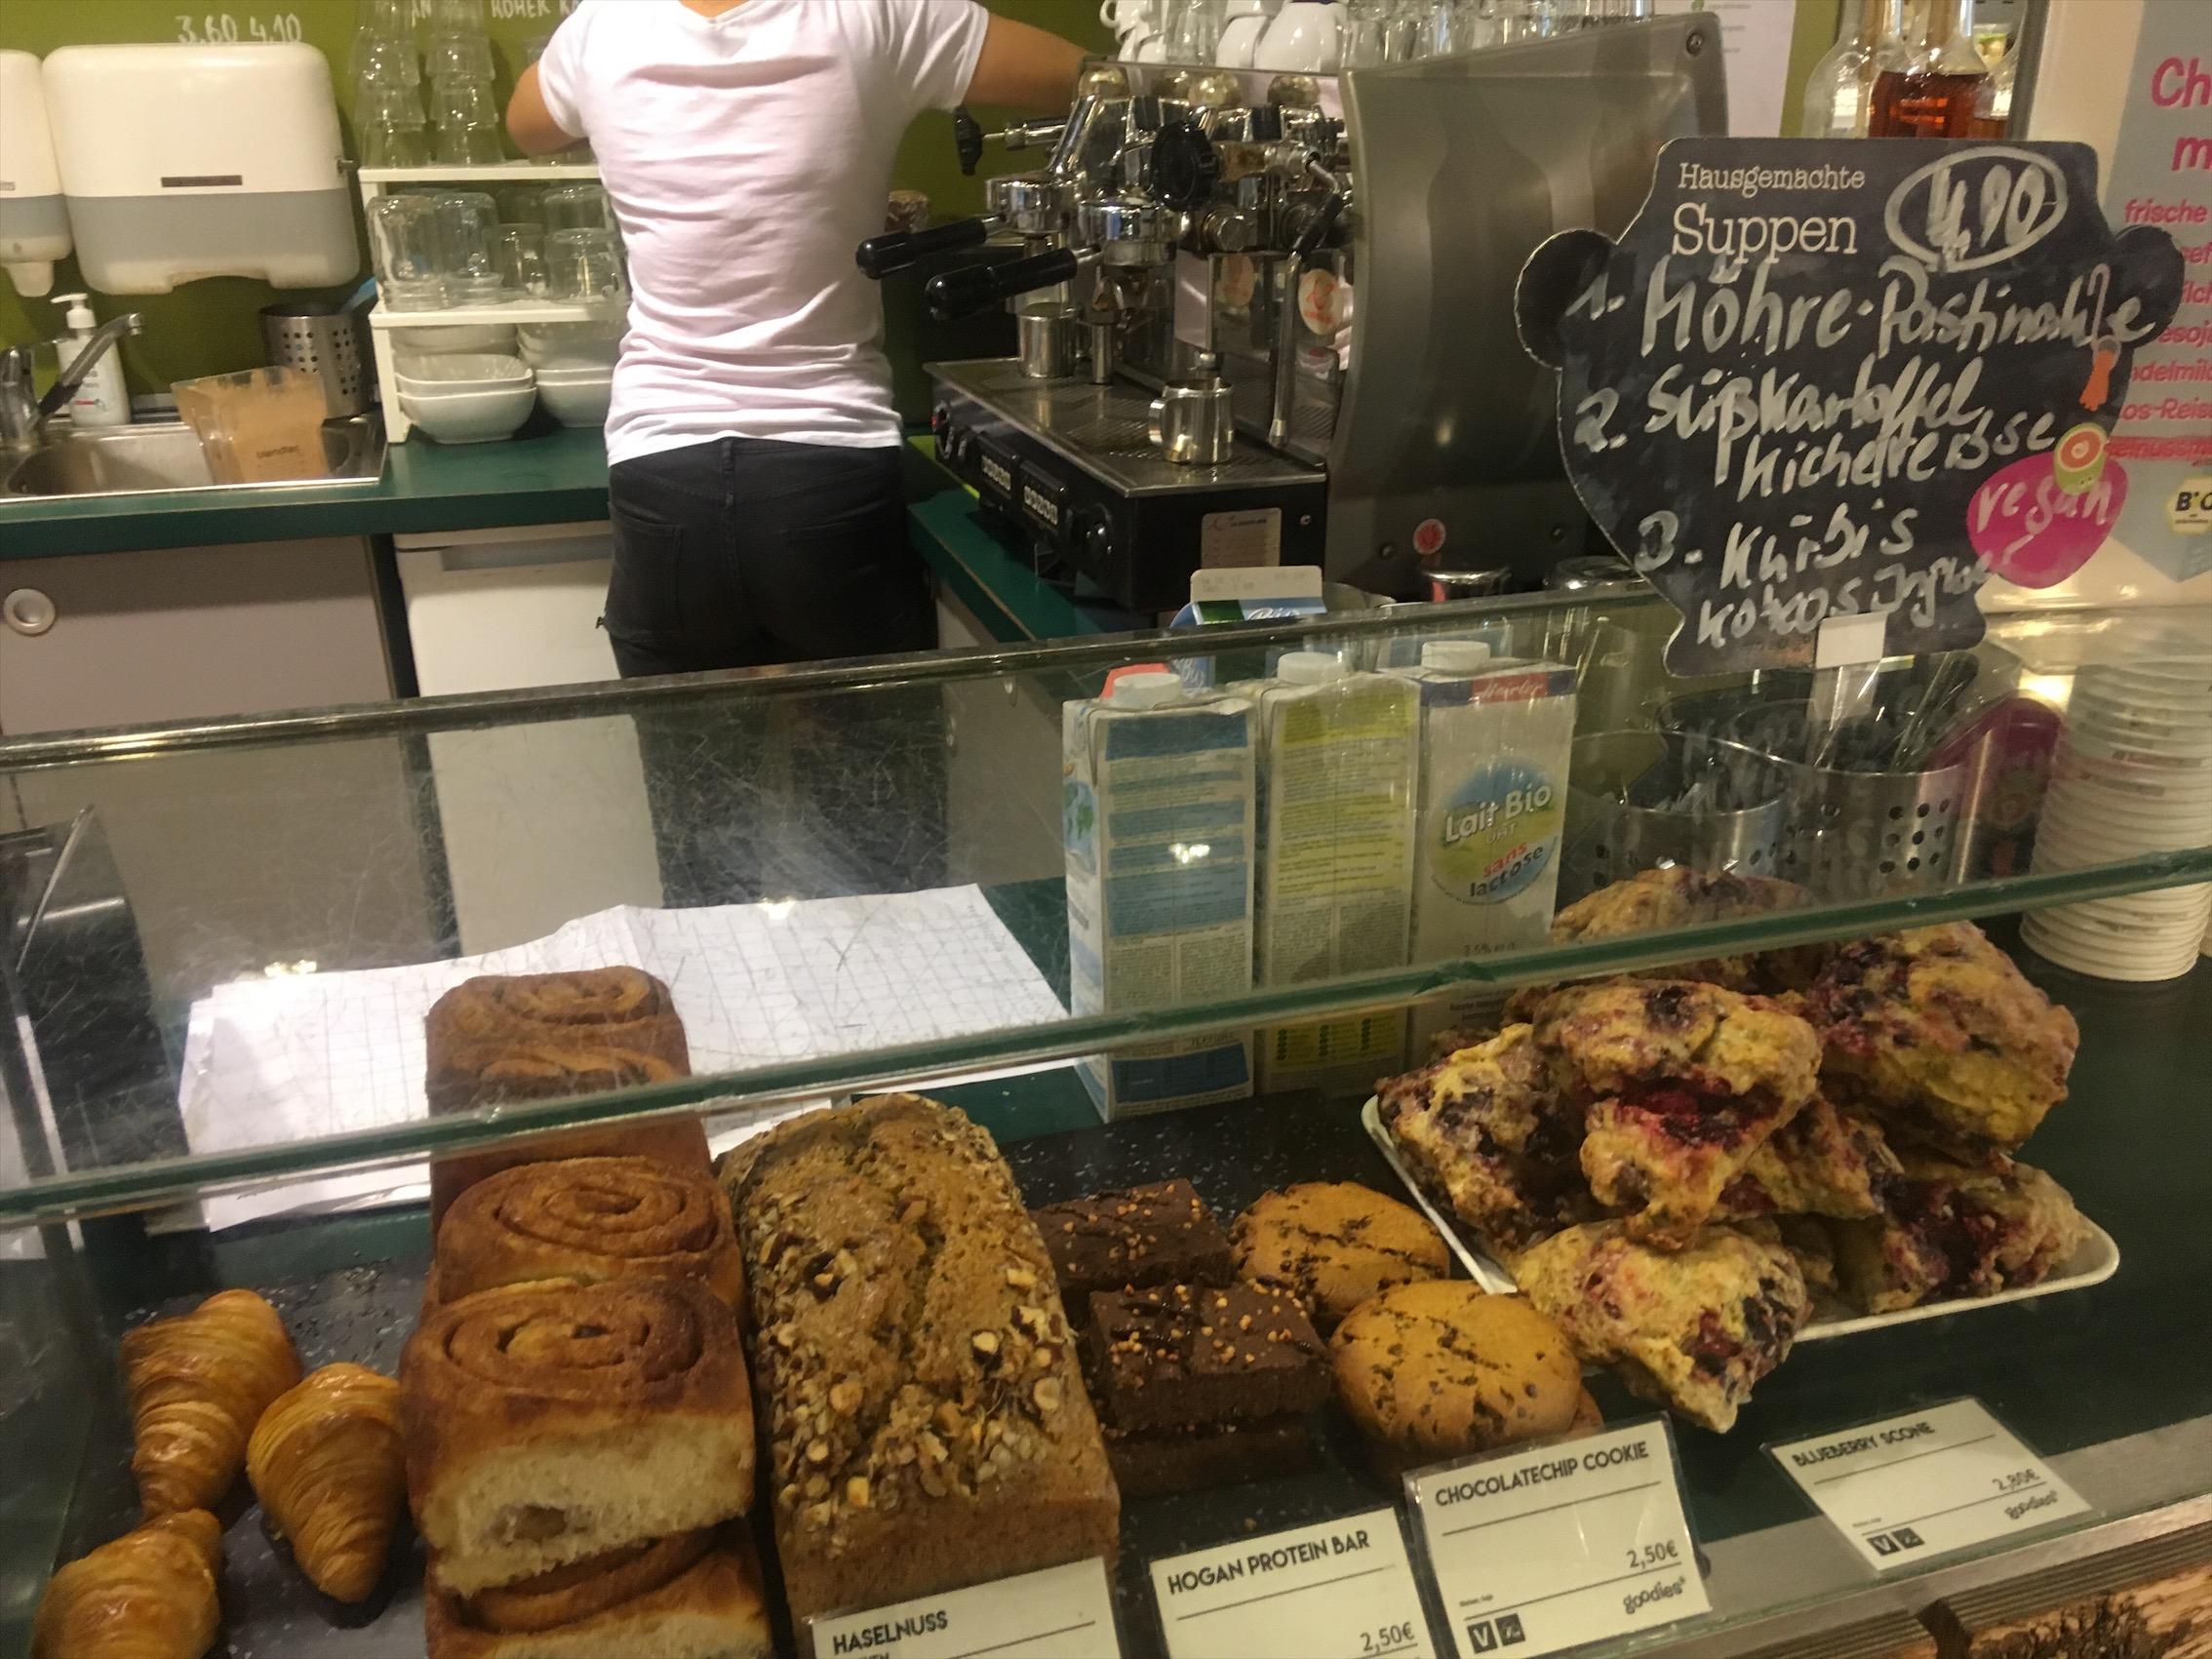 Vegan In Berlin – Vegan Restaurants & Living in Berlin and Beyond